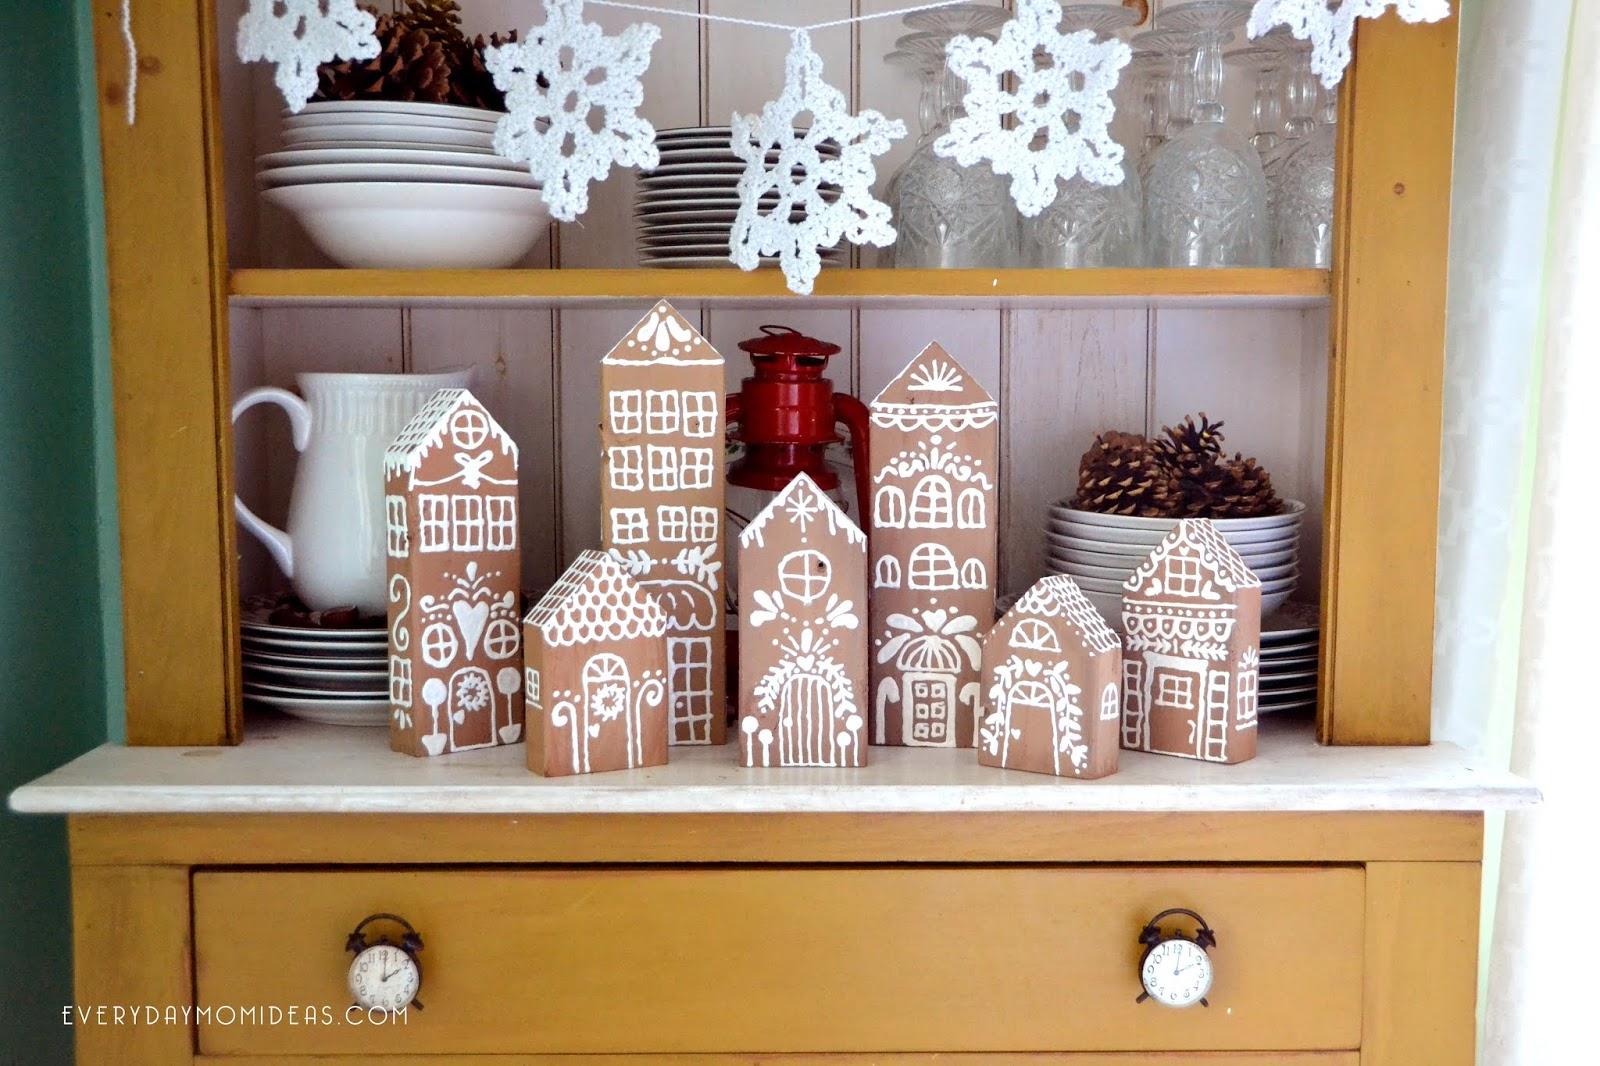 2x4 Wood Gingerbread House Village Cheap Easy Diy Christmas Decor